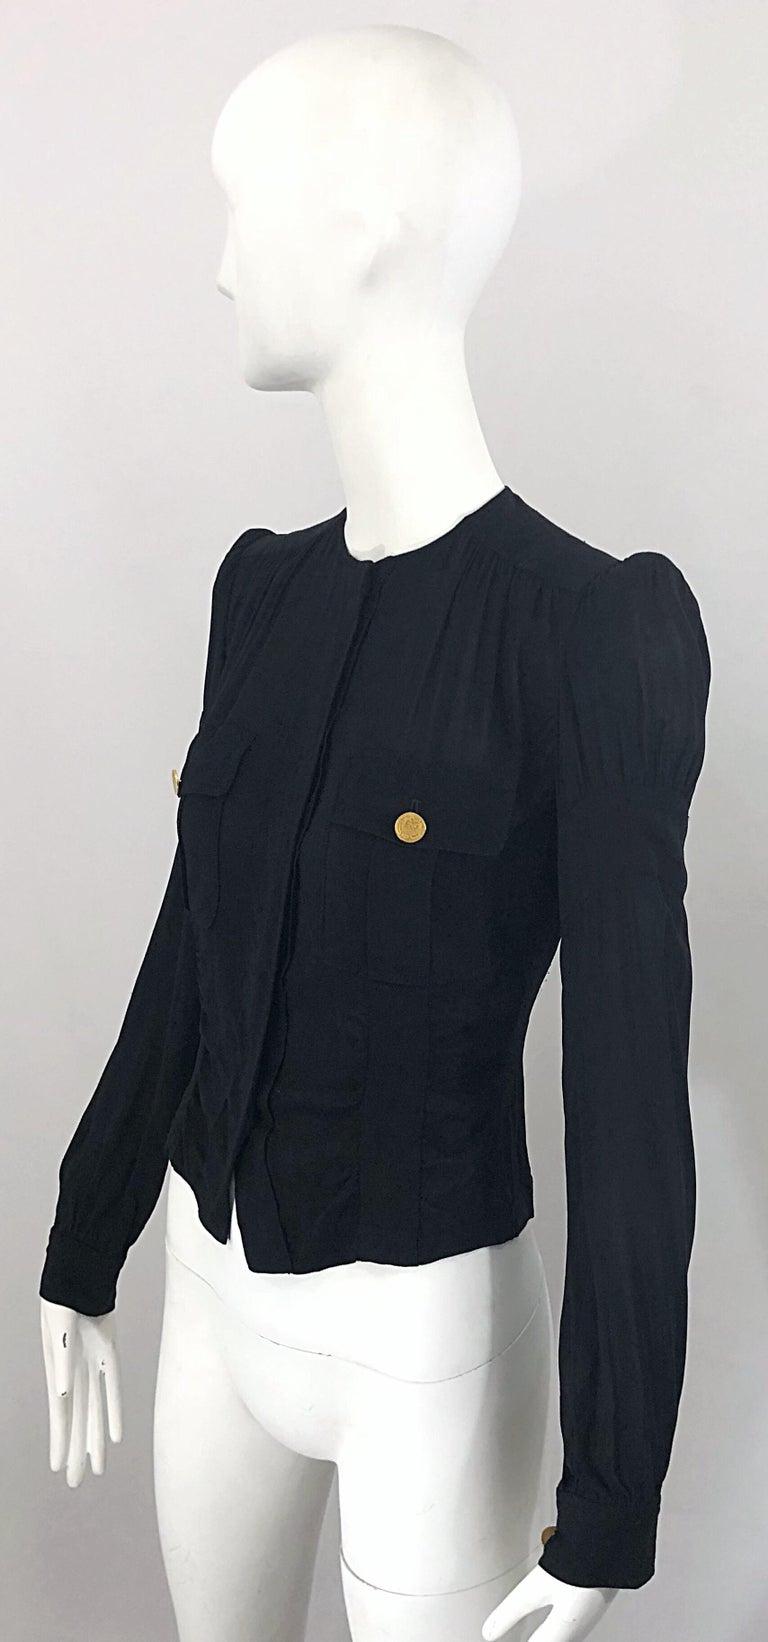 Vintage Donna Karan Collection 1990s Black Size 2 / 4 Puff Sleeve Shirt Jacket For Sale 1